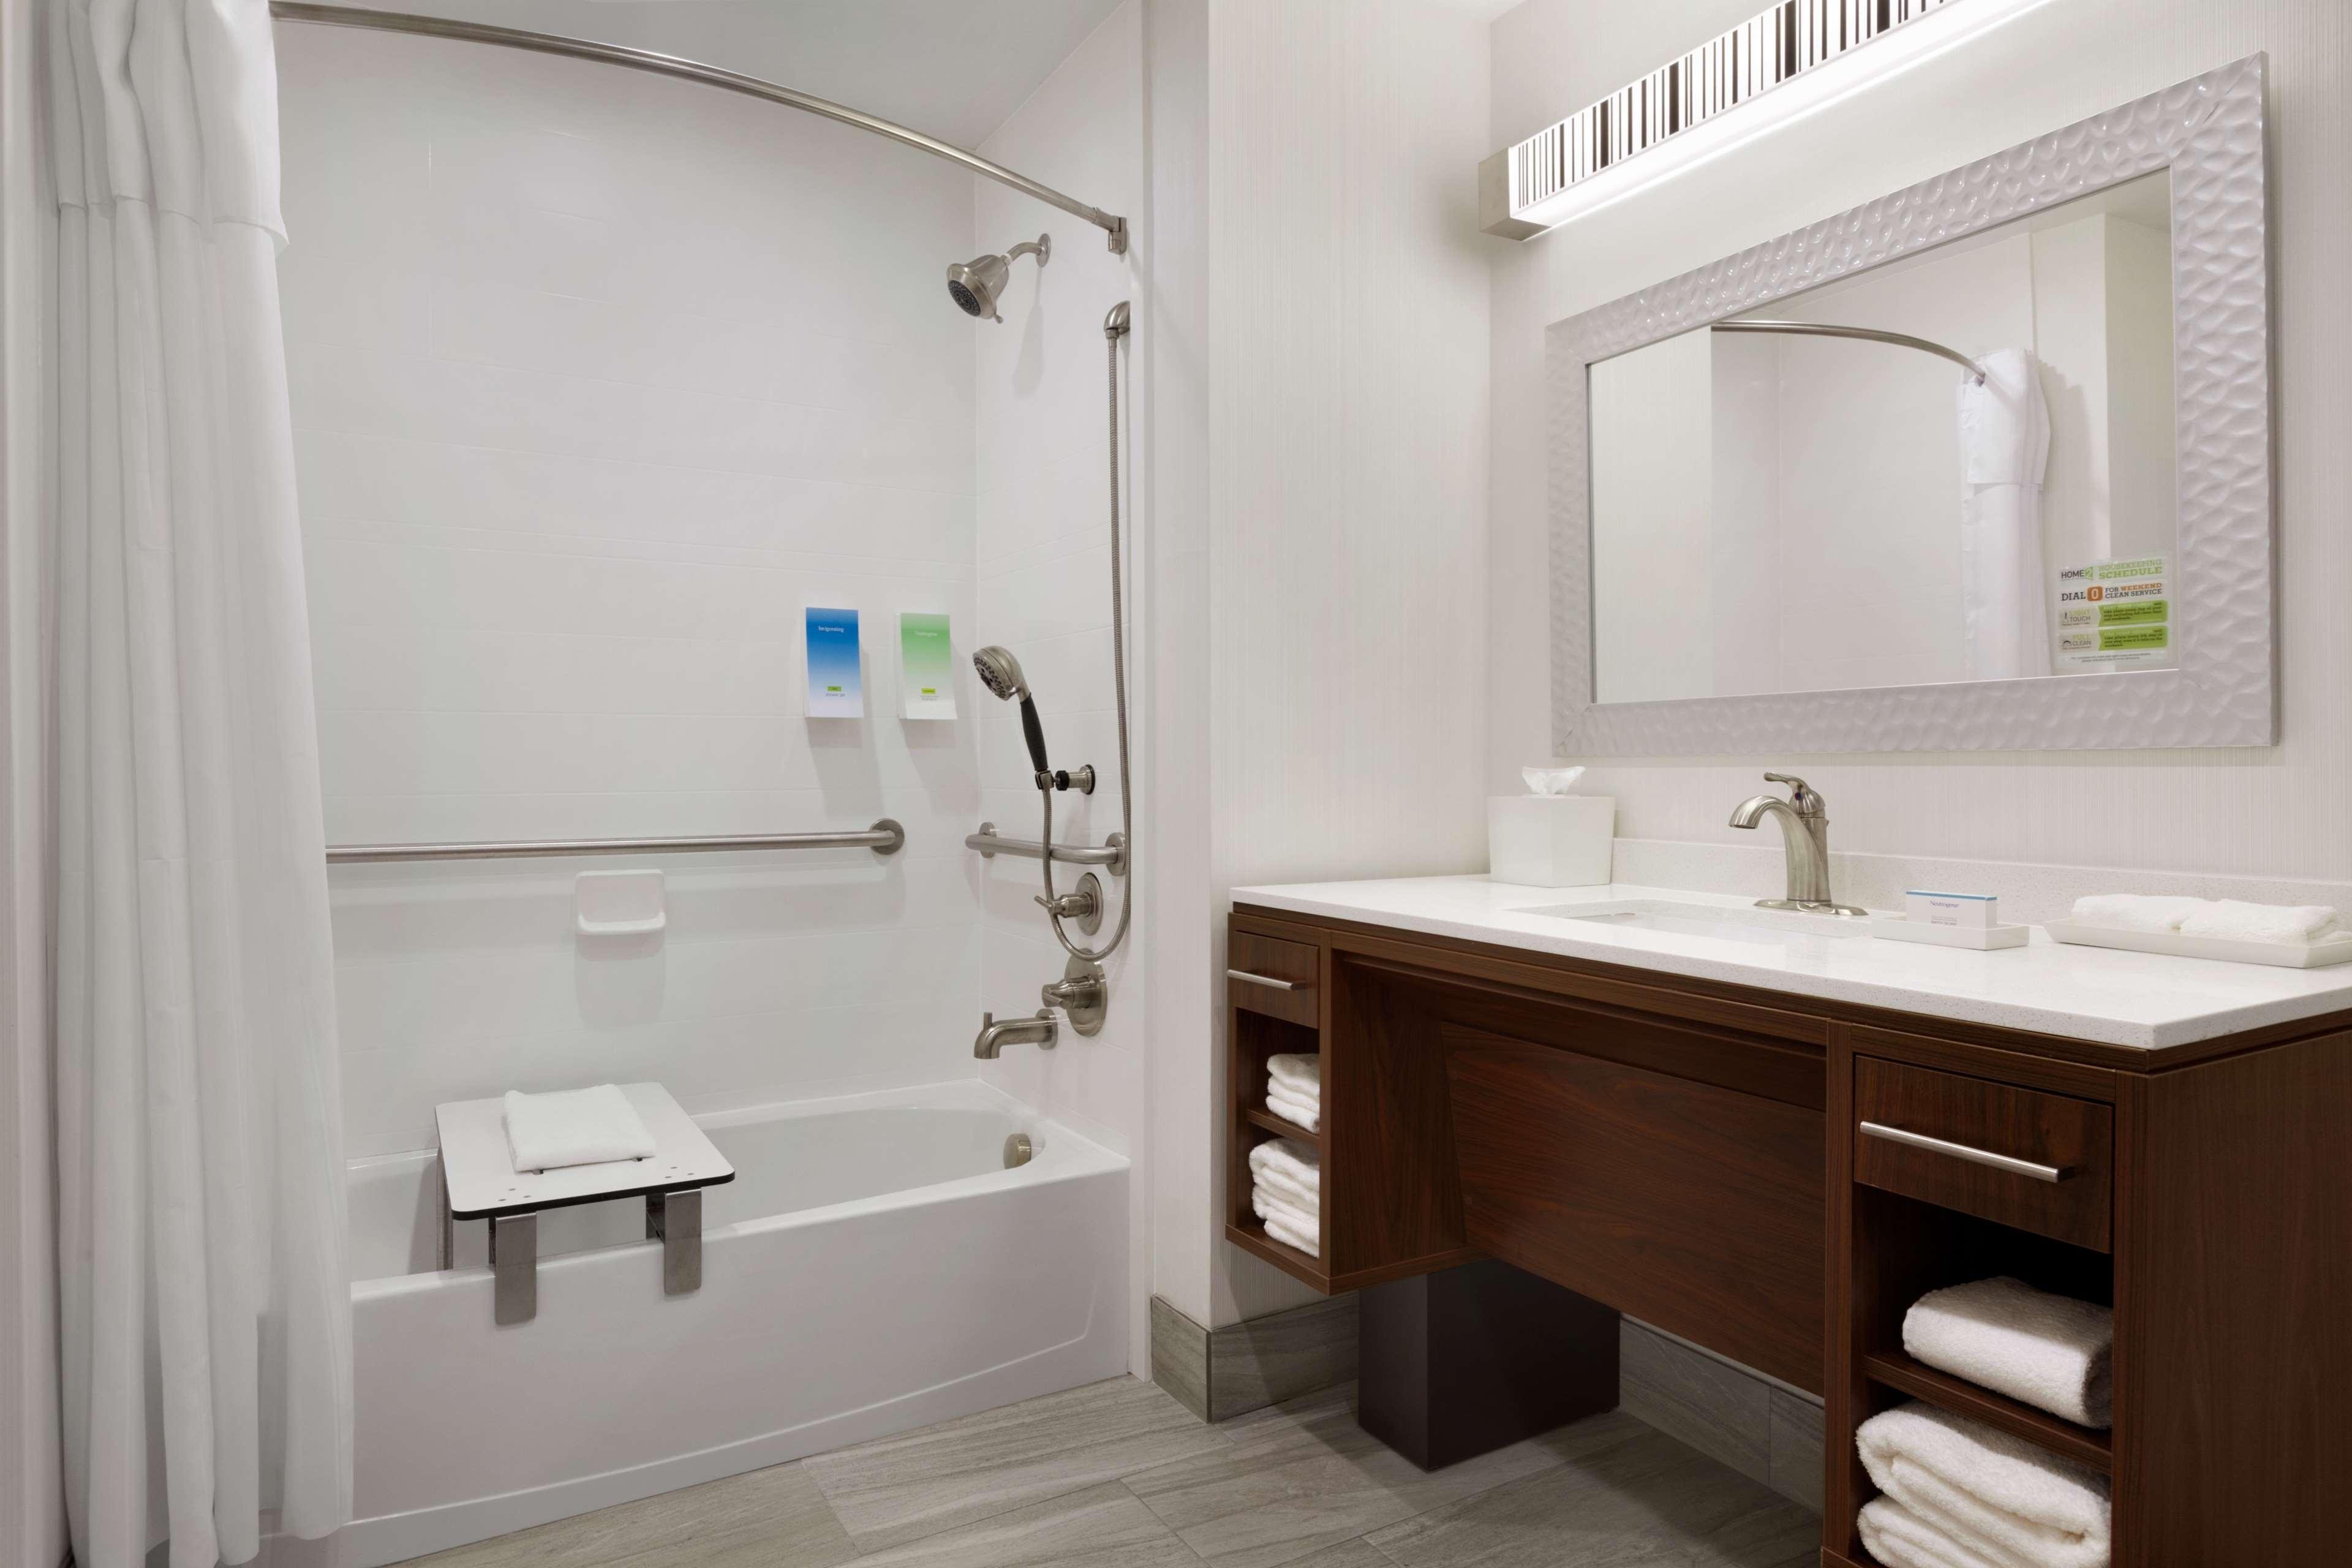 Home2 Suites by Hilton West Monroe image 14